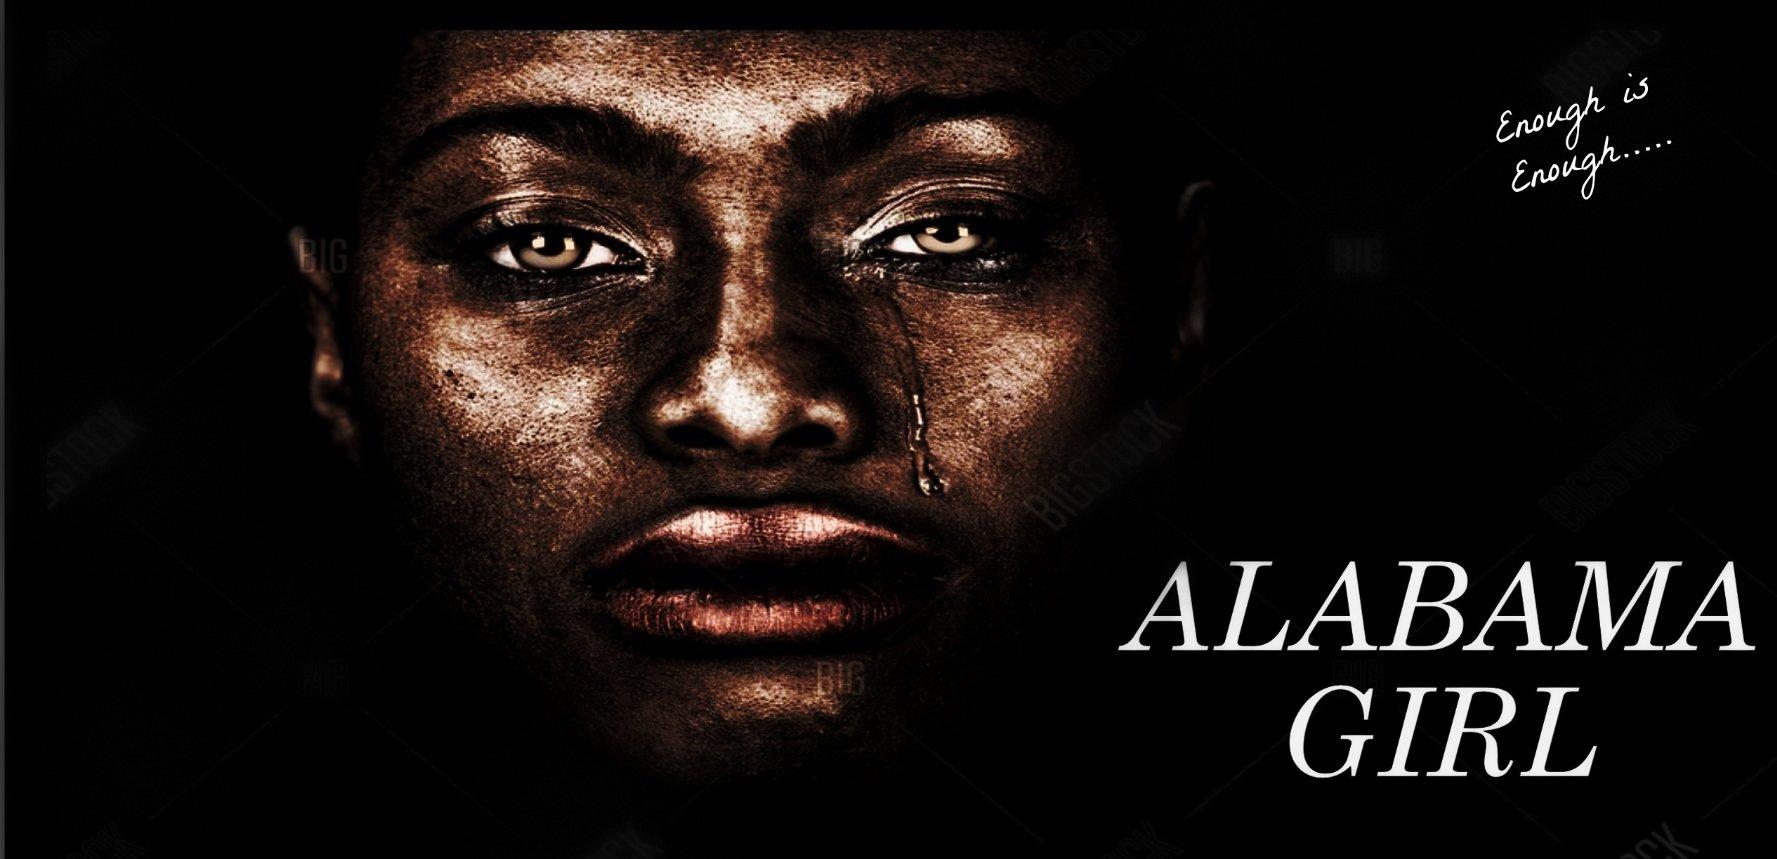 Alabama Girl (2017)